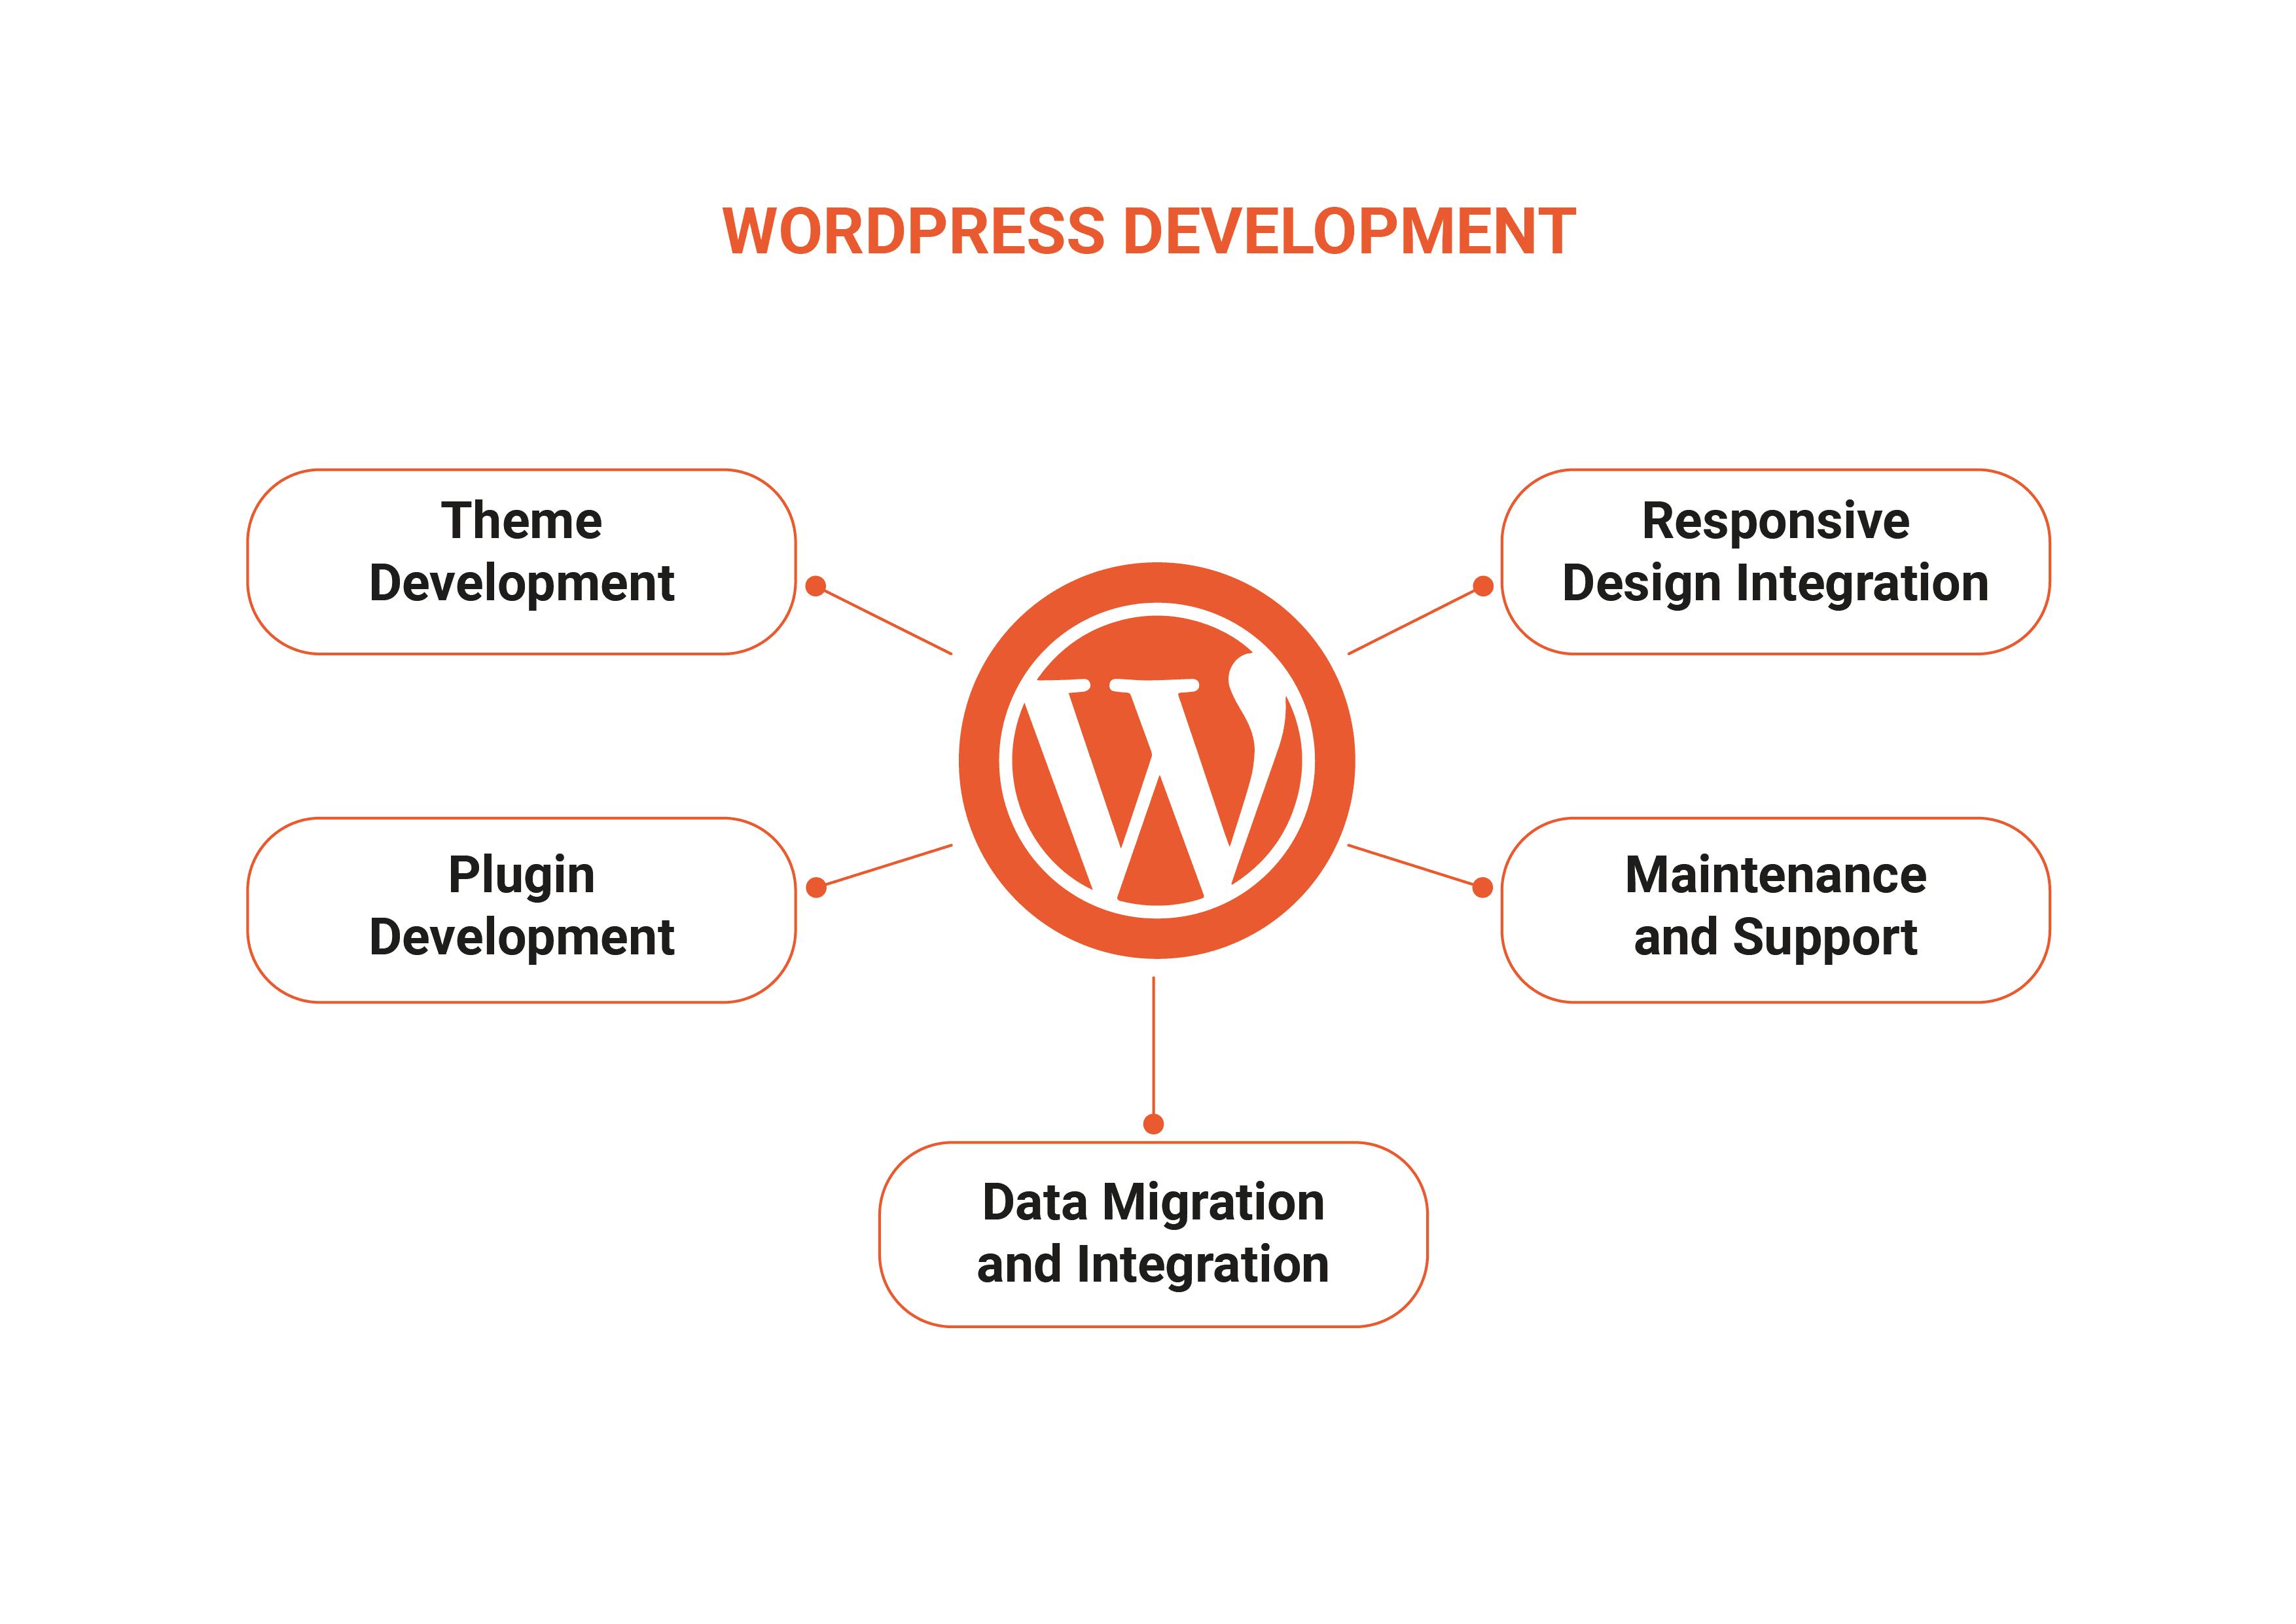 Wordpress development capabilities